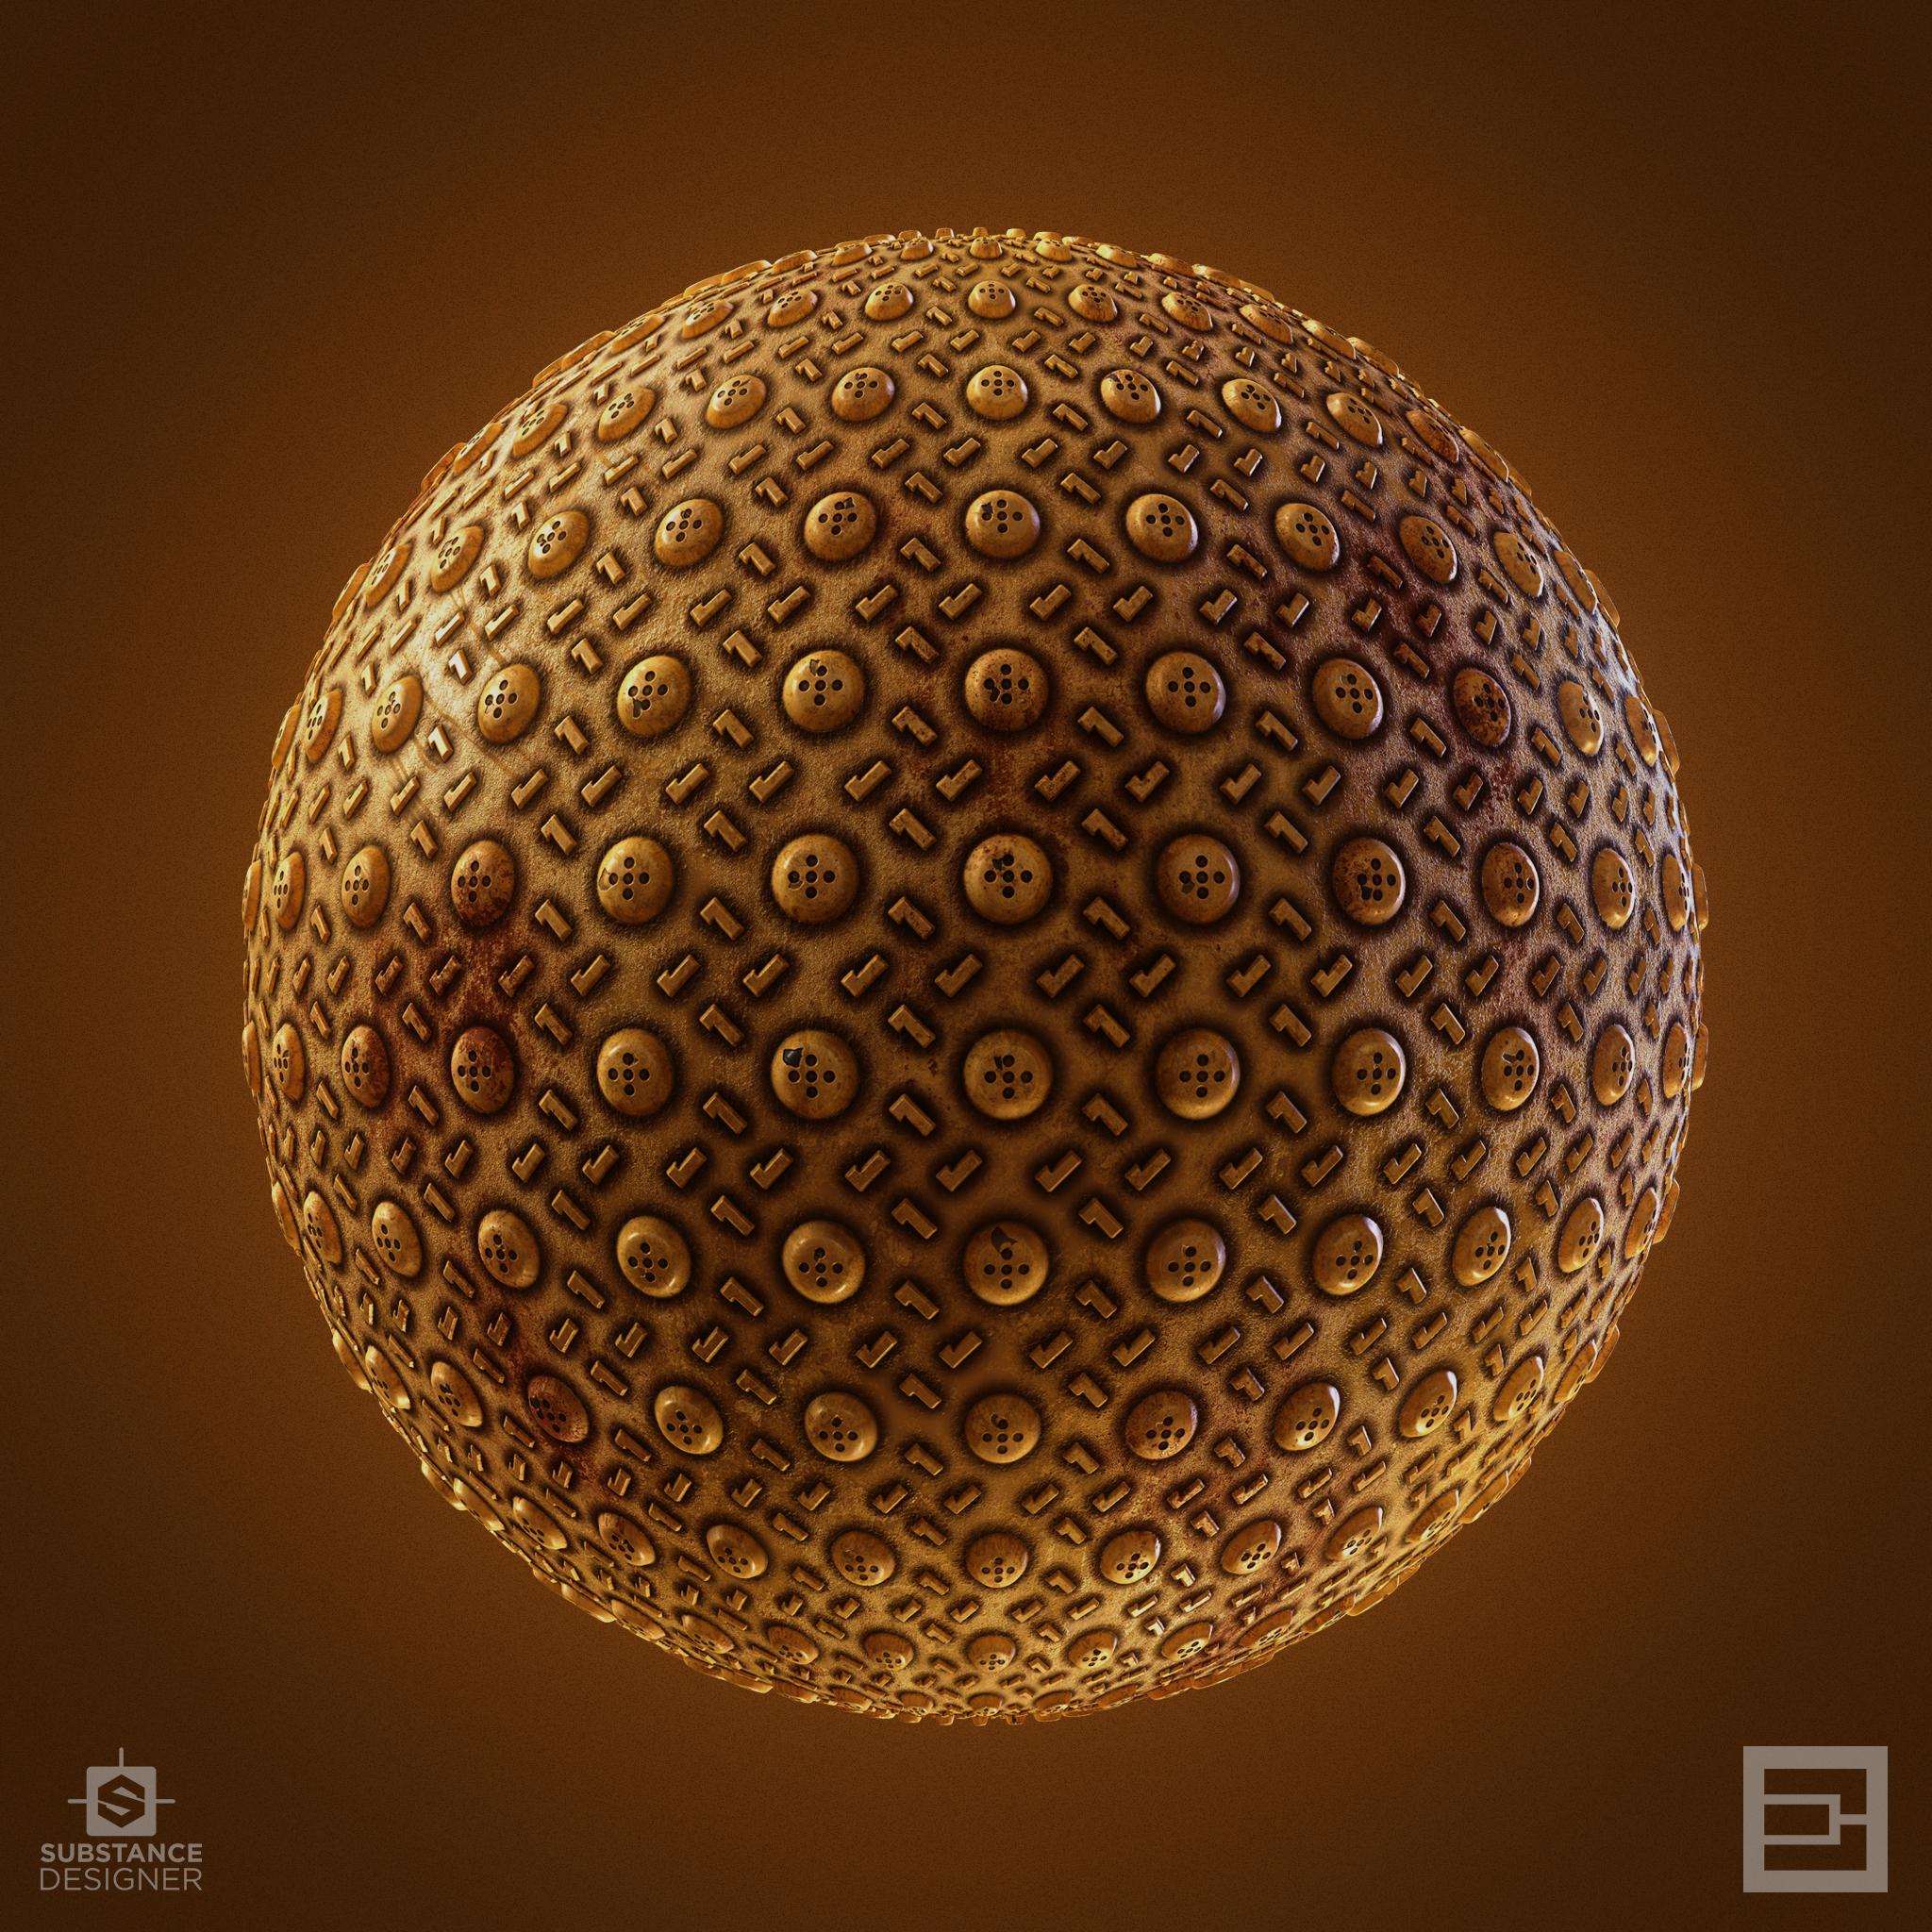 MetalBase_YellowBumps_01_Sphere_02.jpg